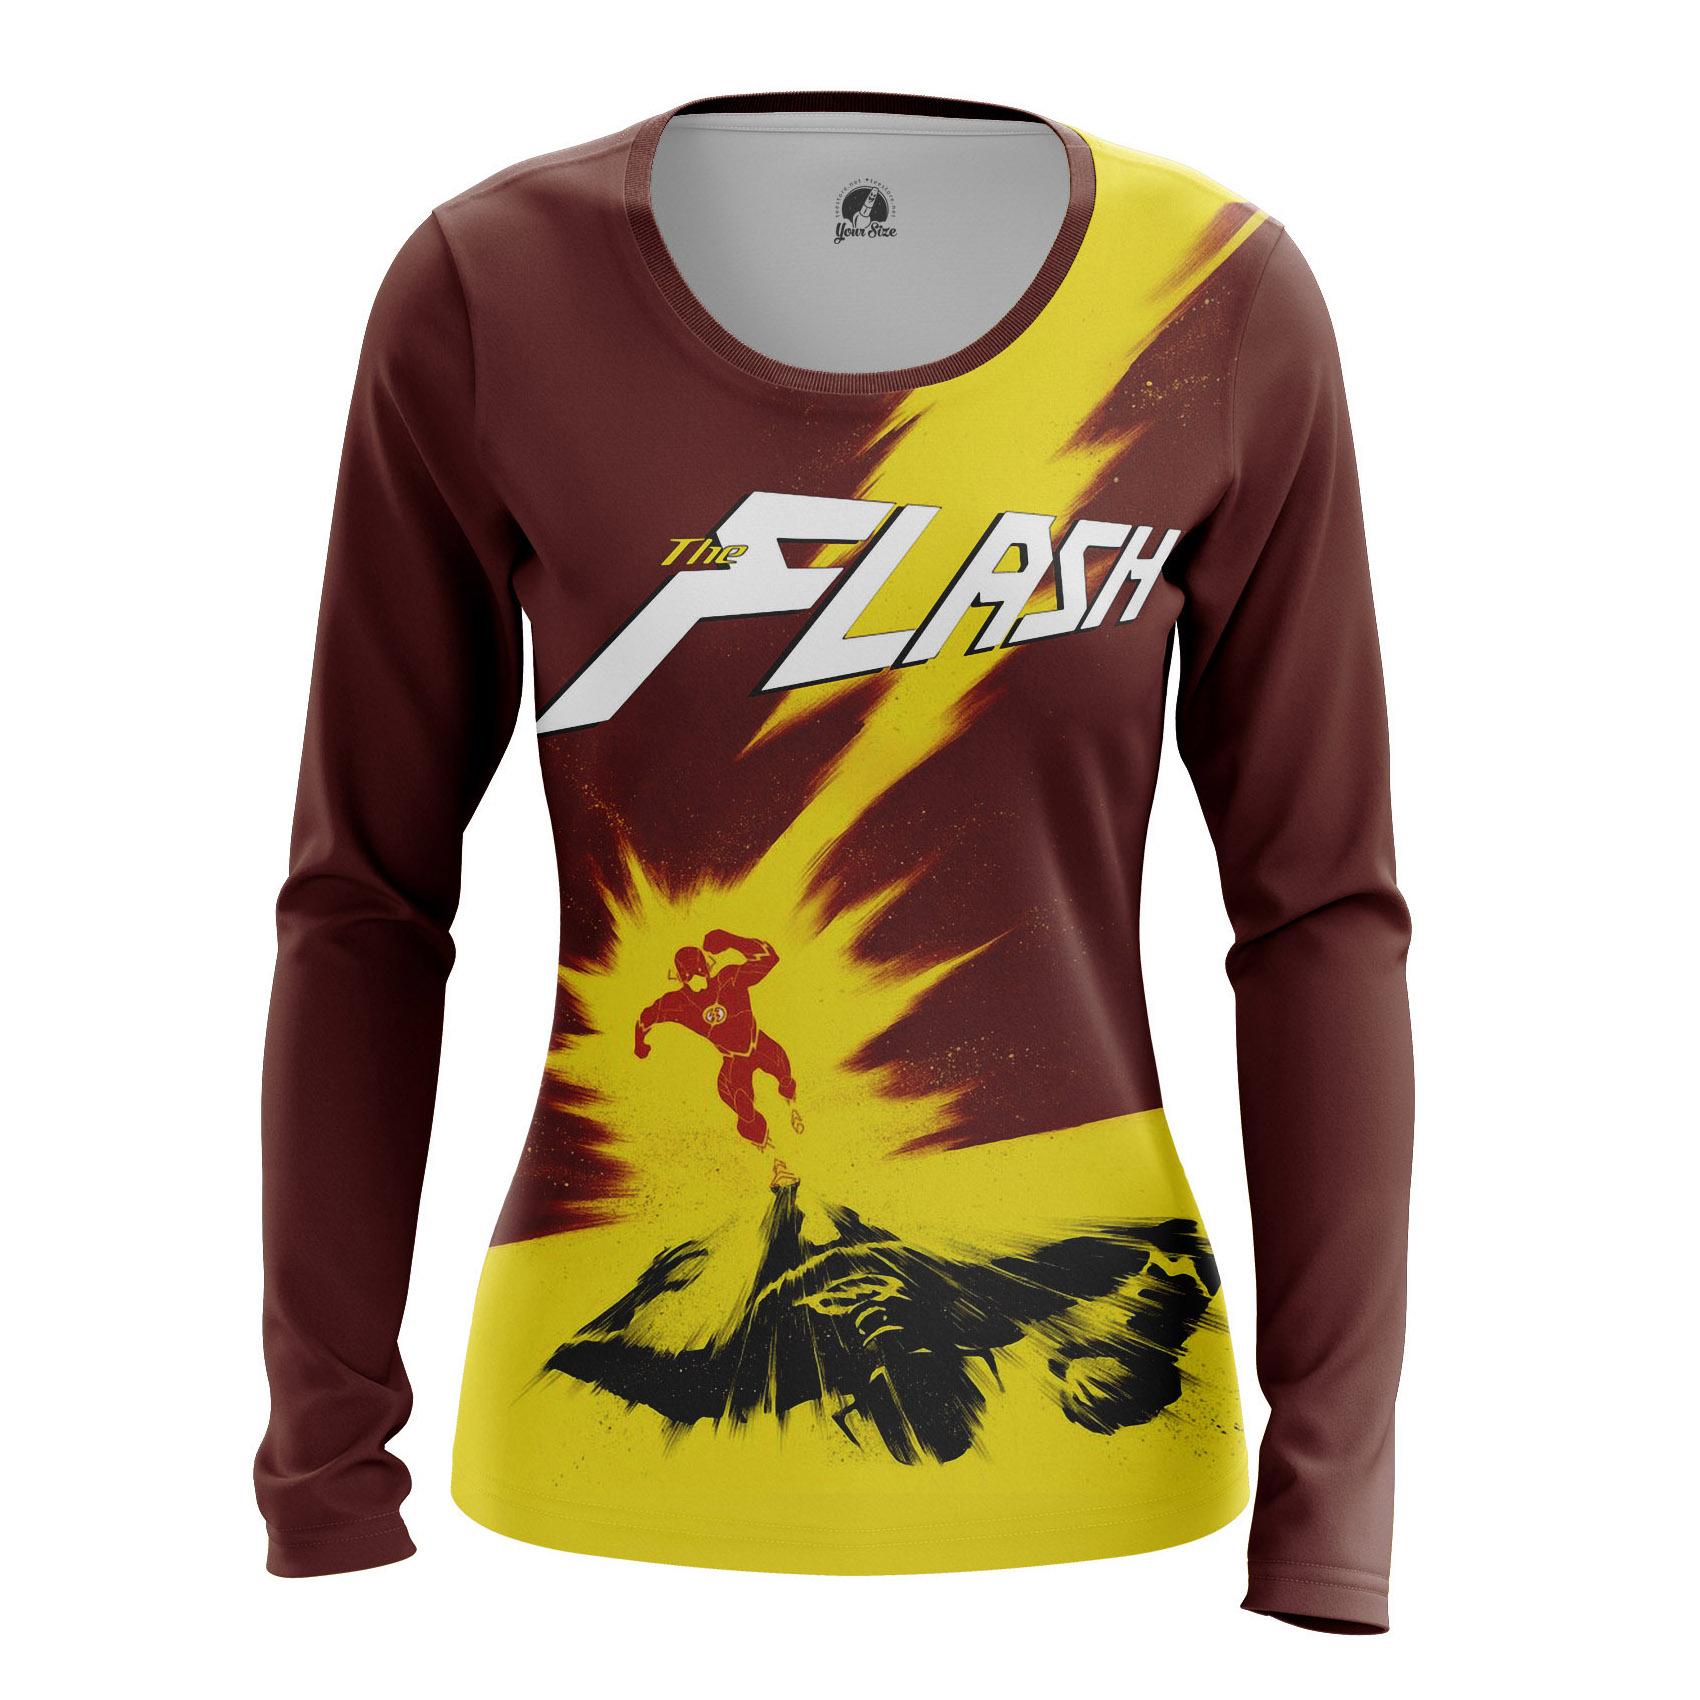 Merch Women'S Raglan The Flash Running